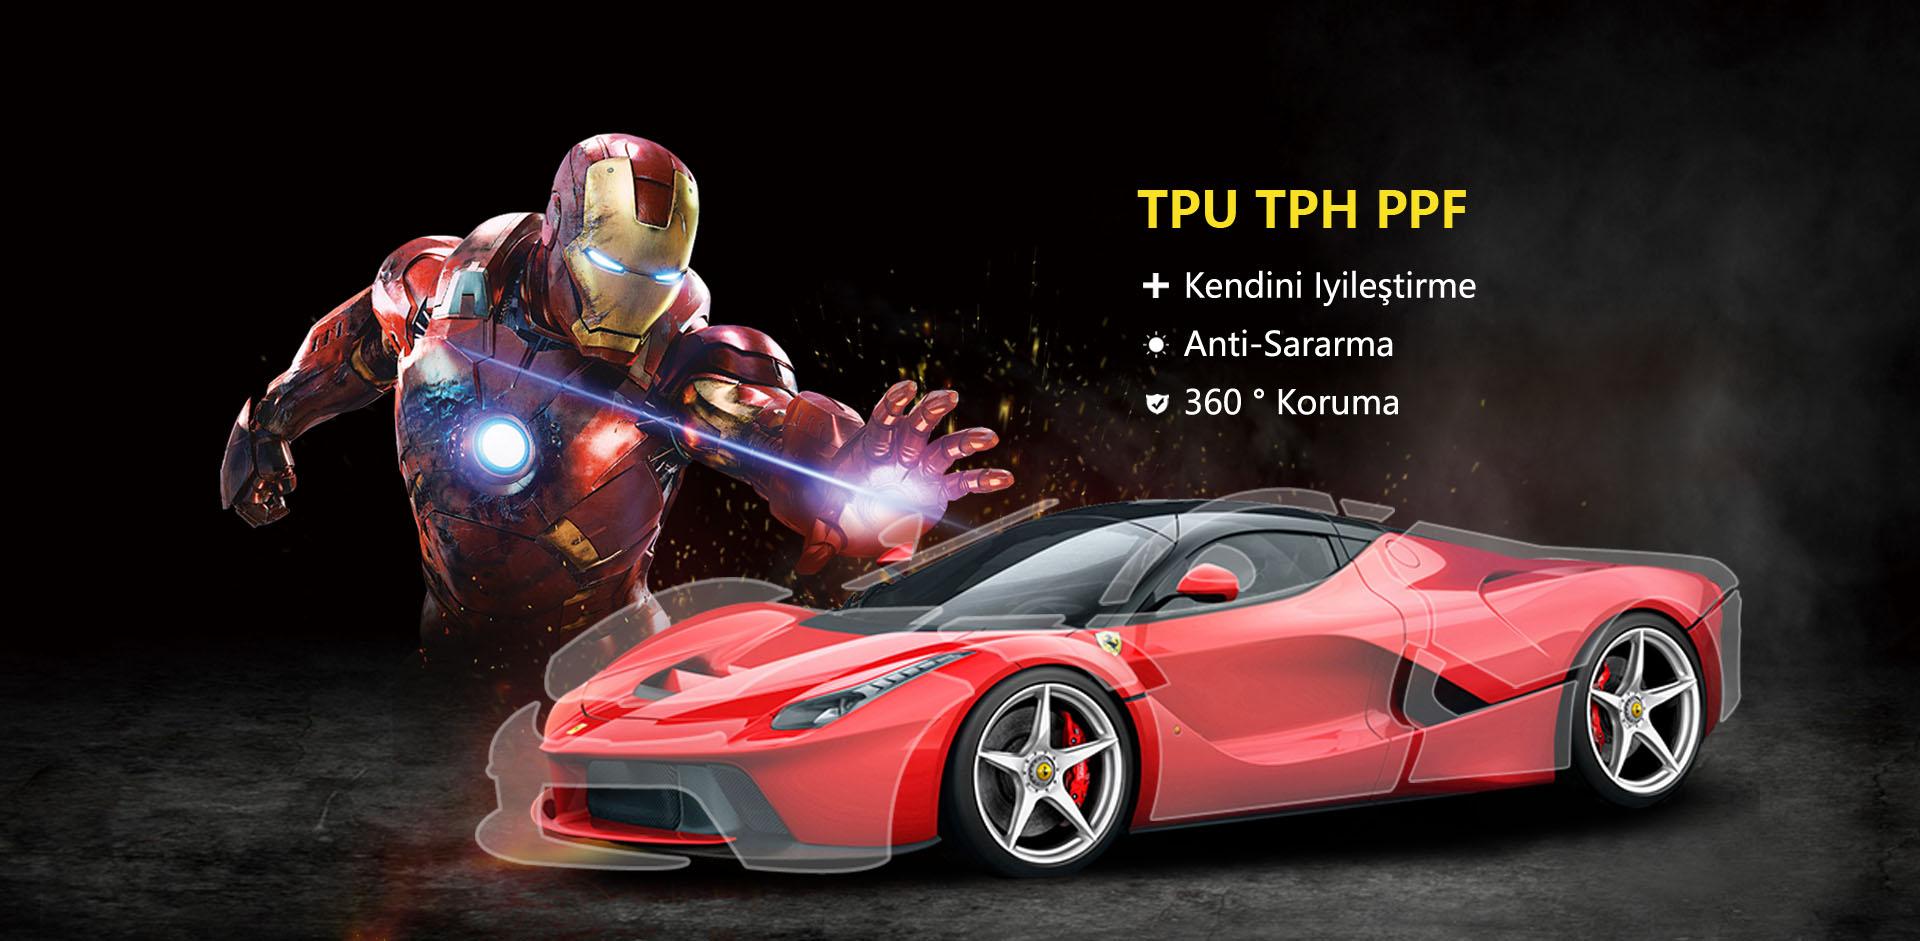 PPF TPU TPH Car Paint Protection Film